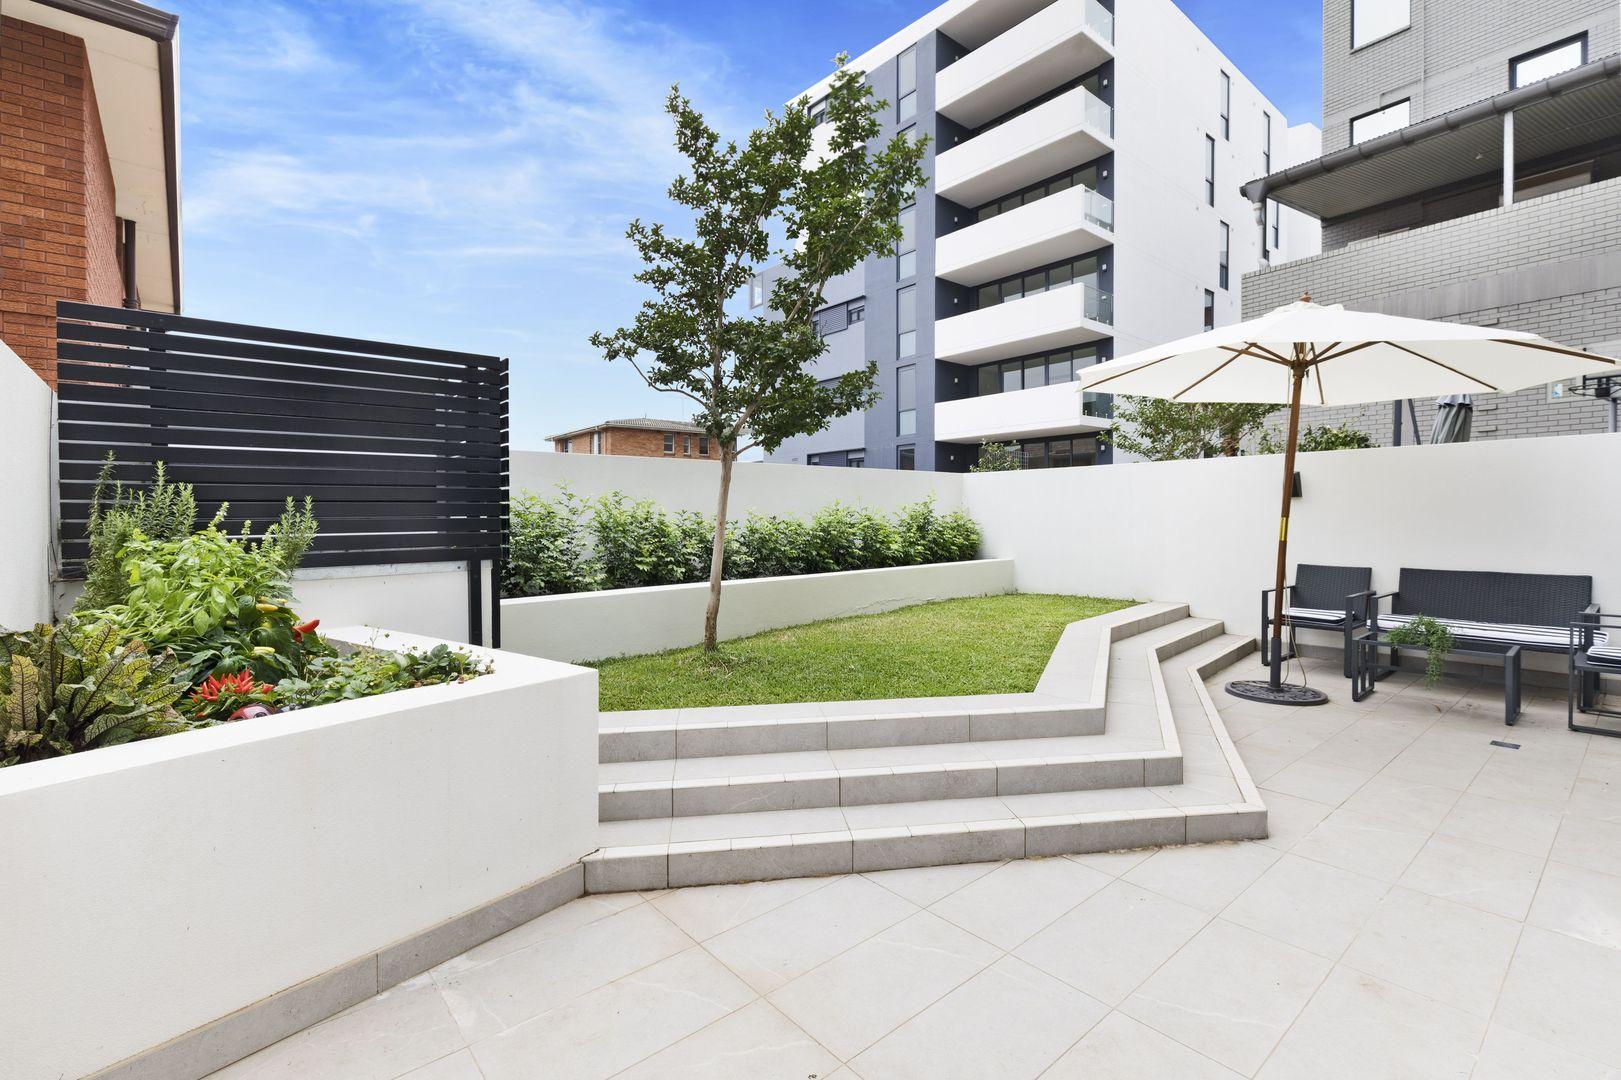 1/9 Jordan  Street, Gladesville NSW 2111, Image 0